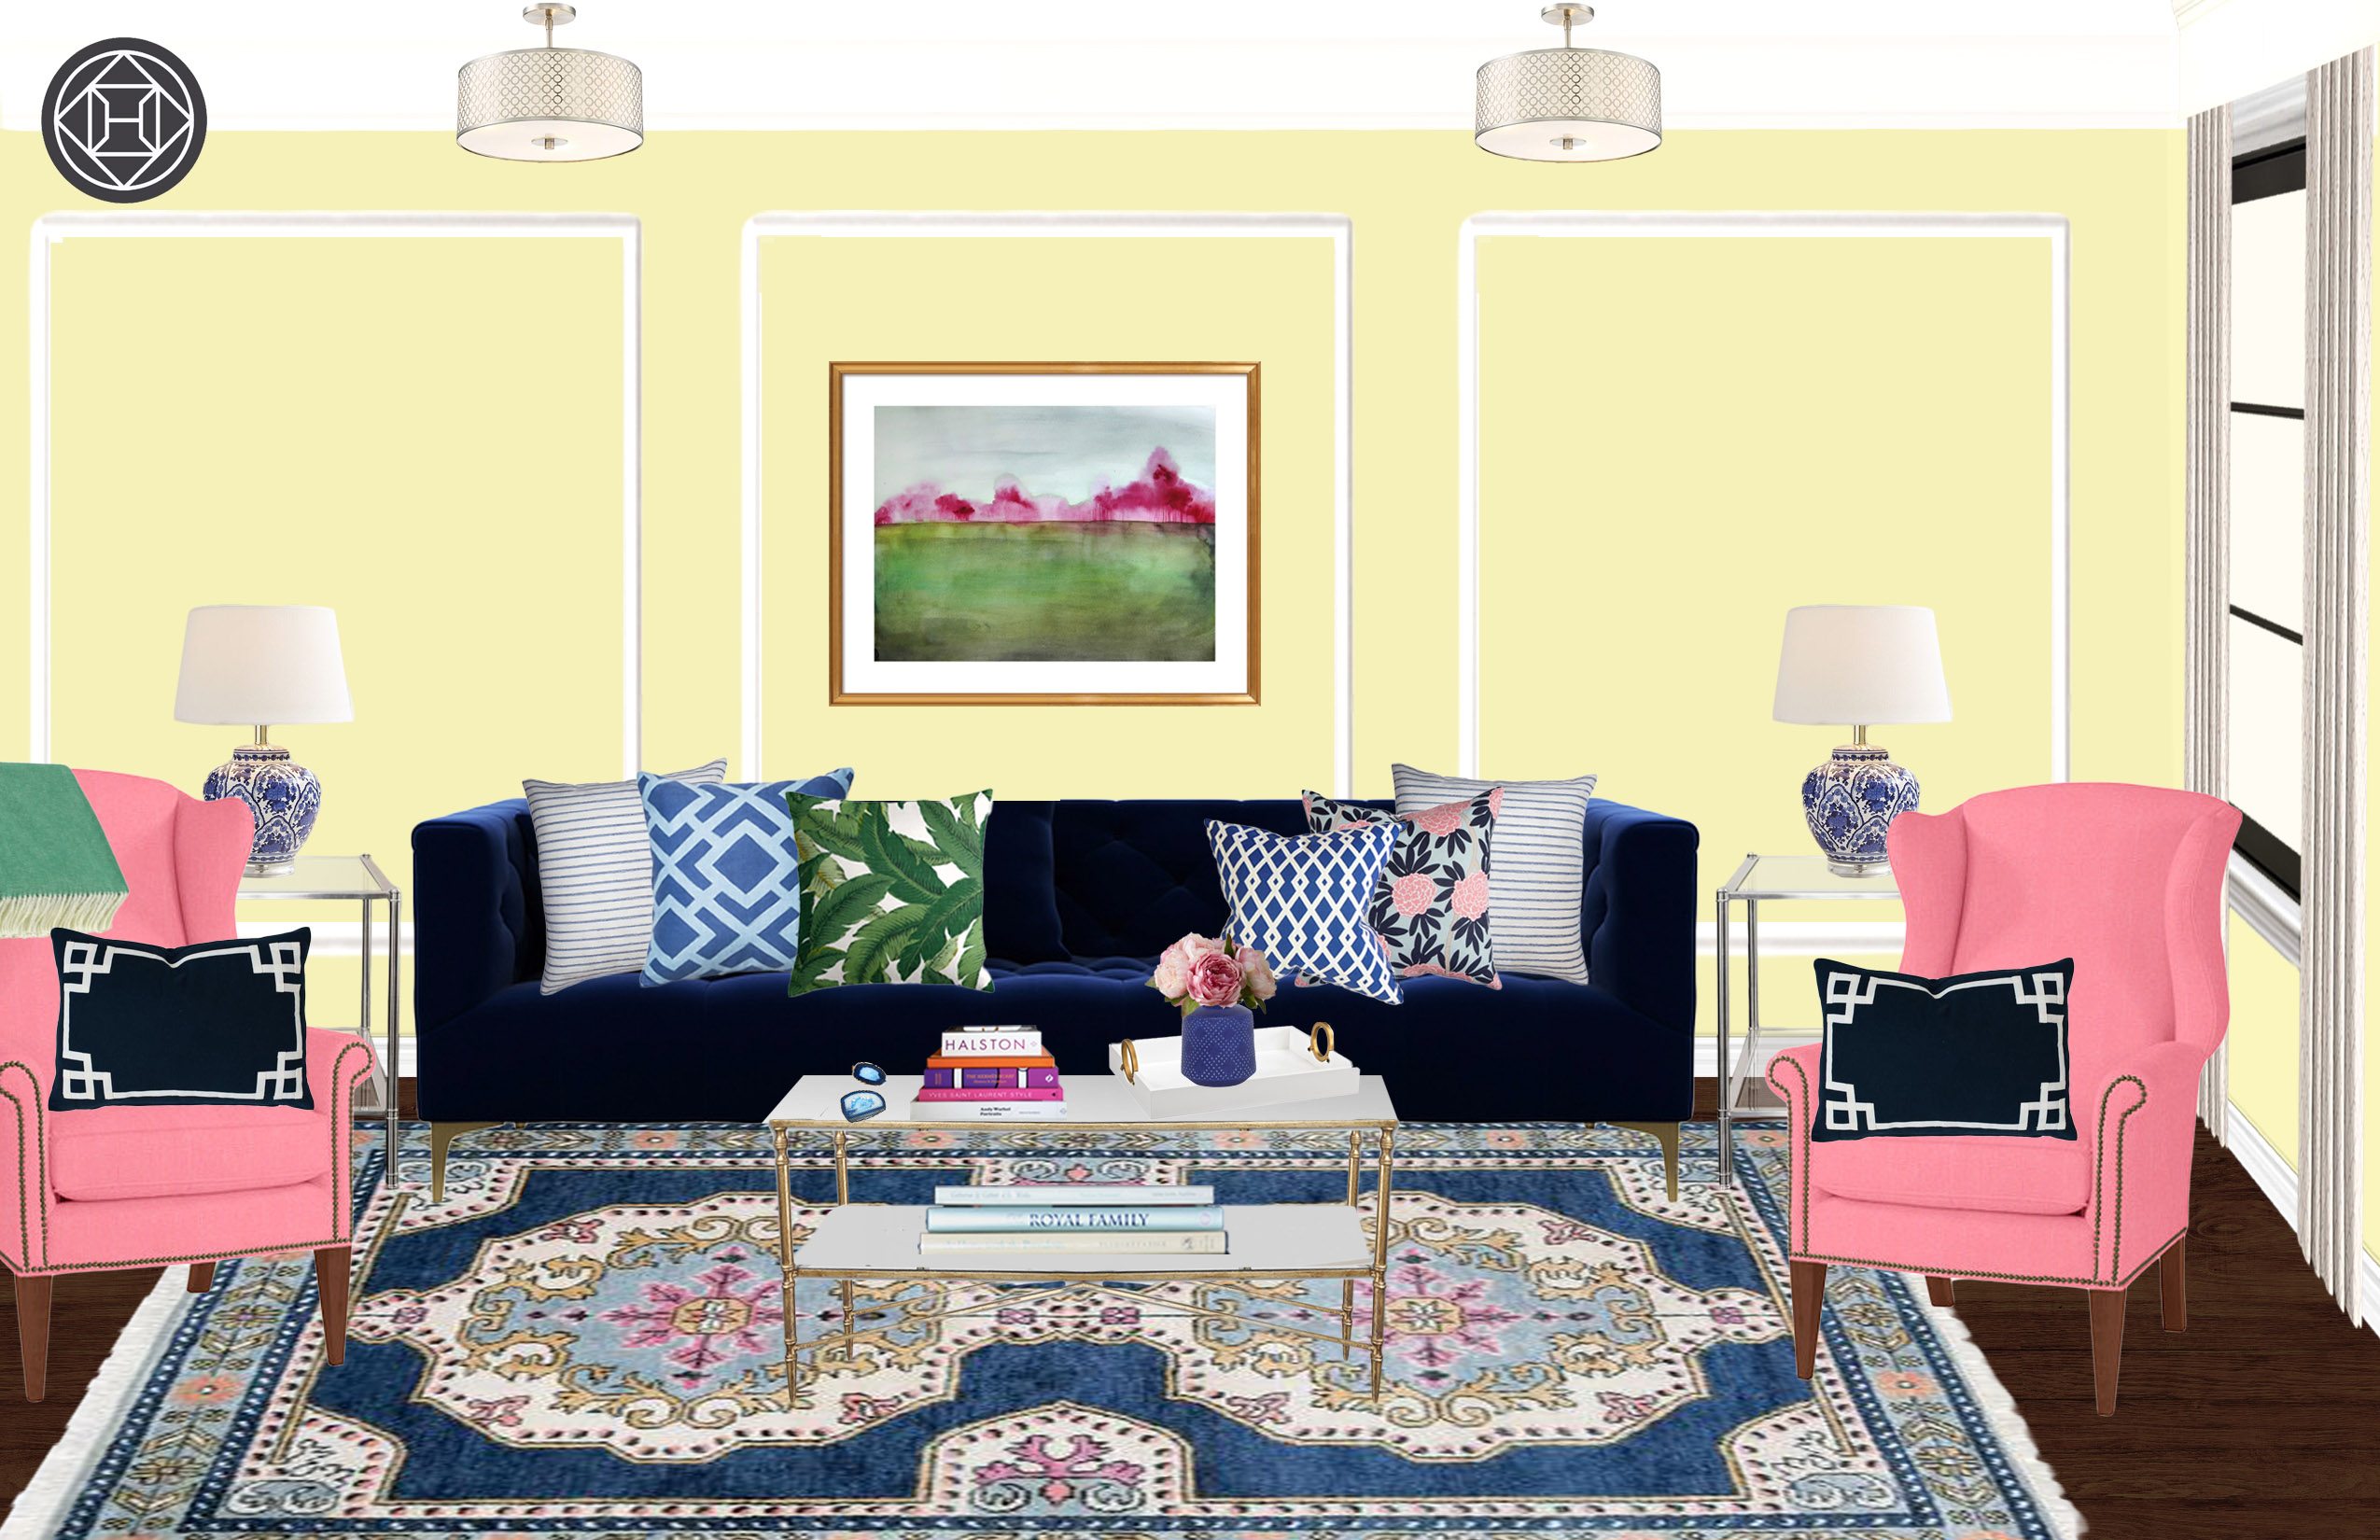 Preppy Living Room Design by Havenly Interior Designer by Erin